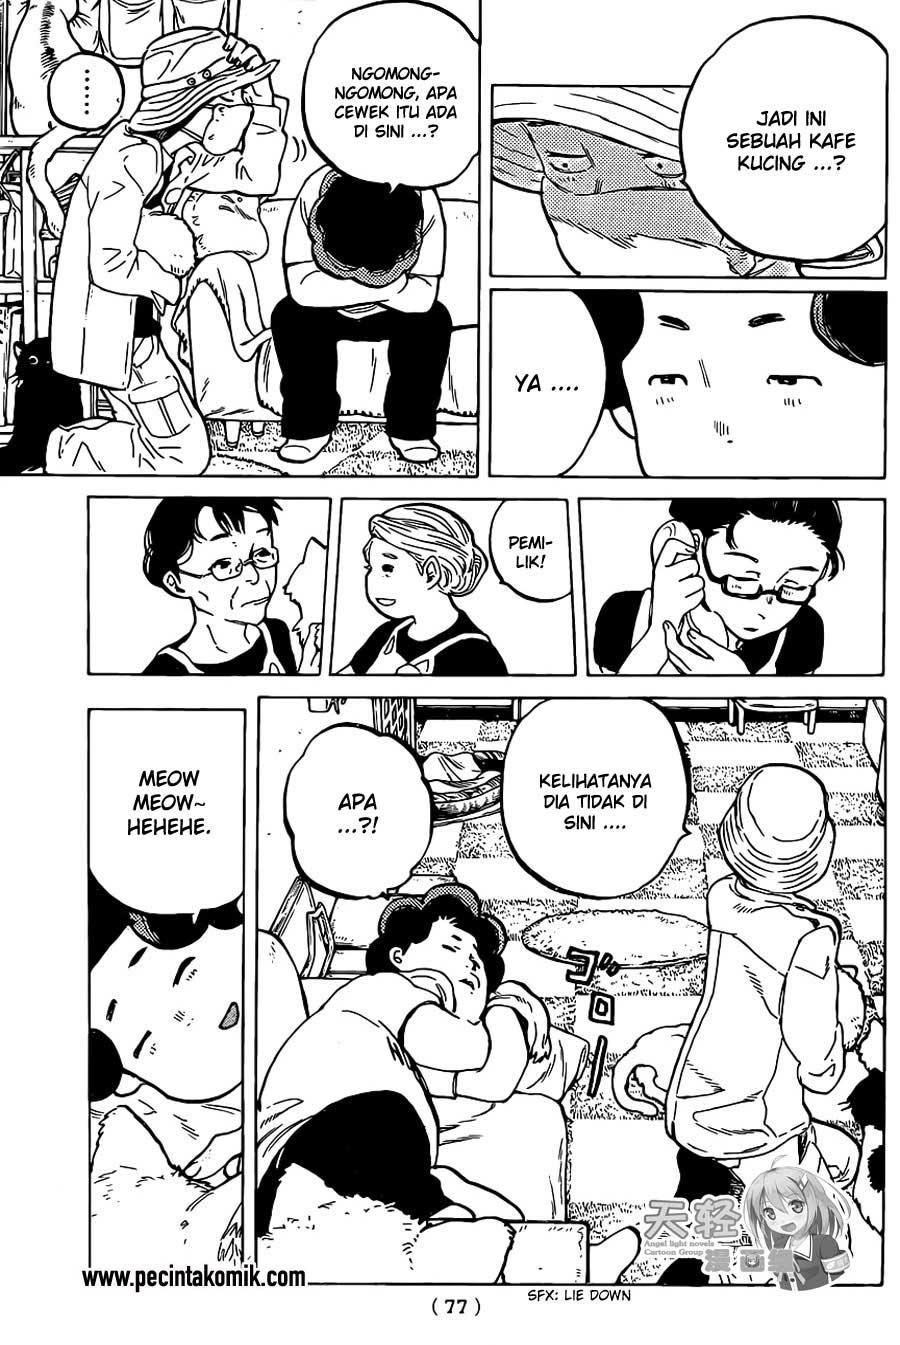 Koe no Katachi Chapter 19-10